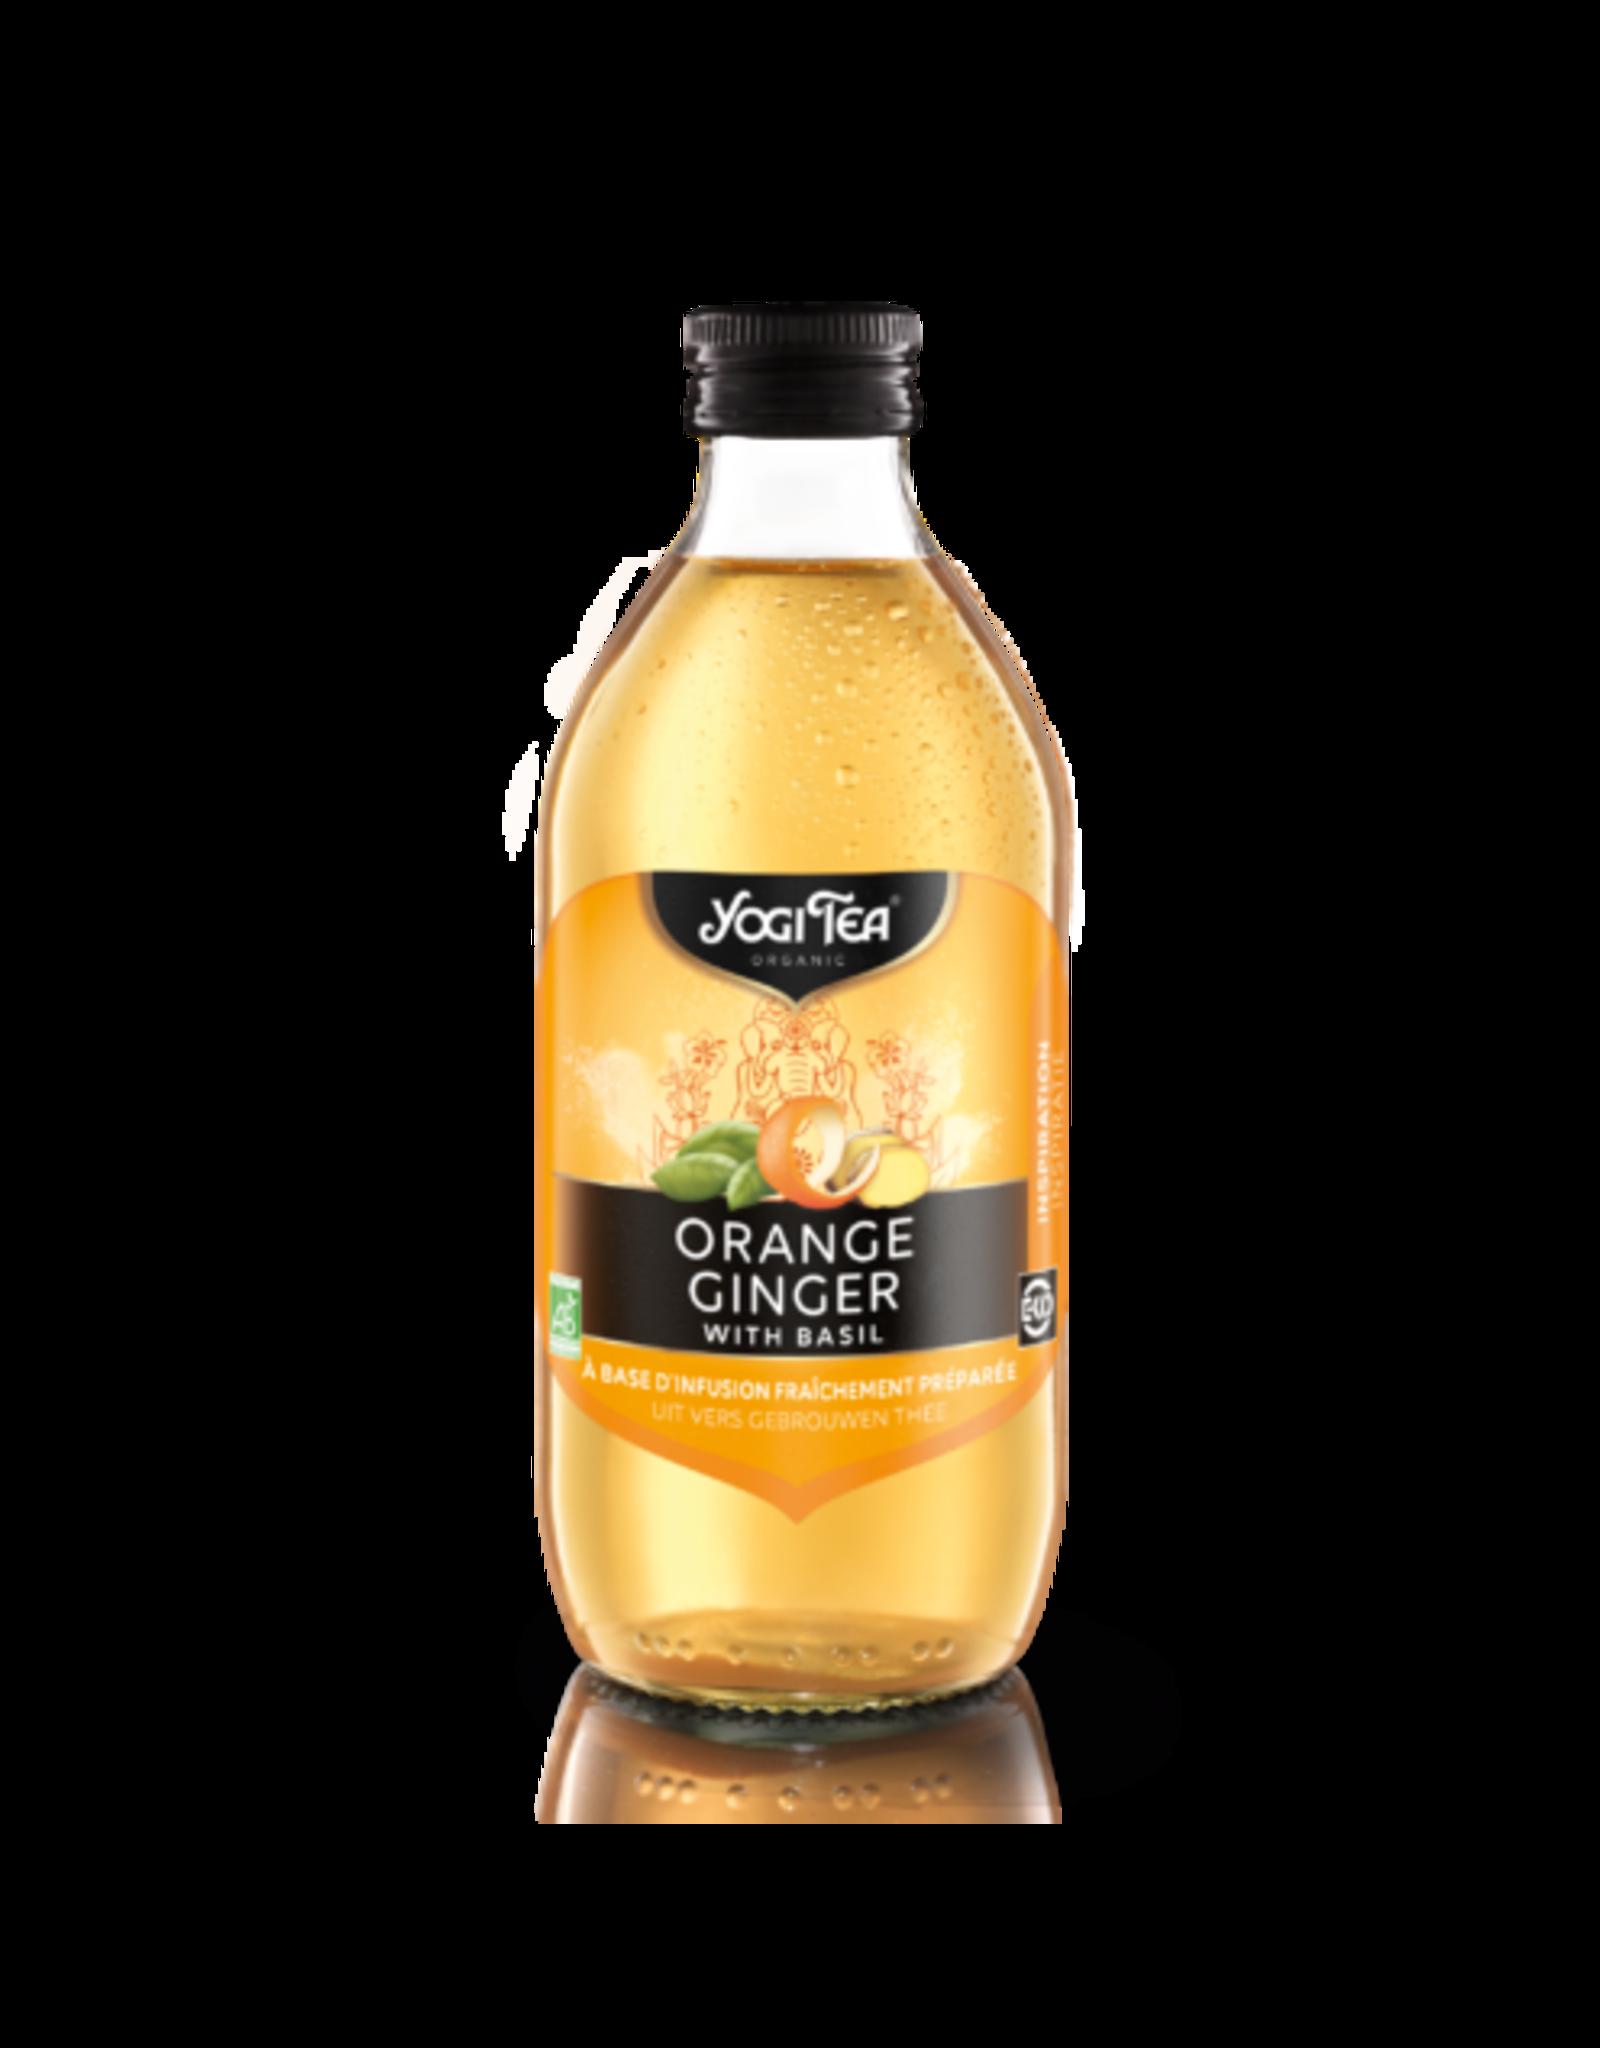 Yogi Tea Yogi Tea cold tea Orange Ginger